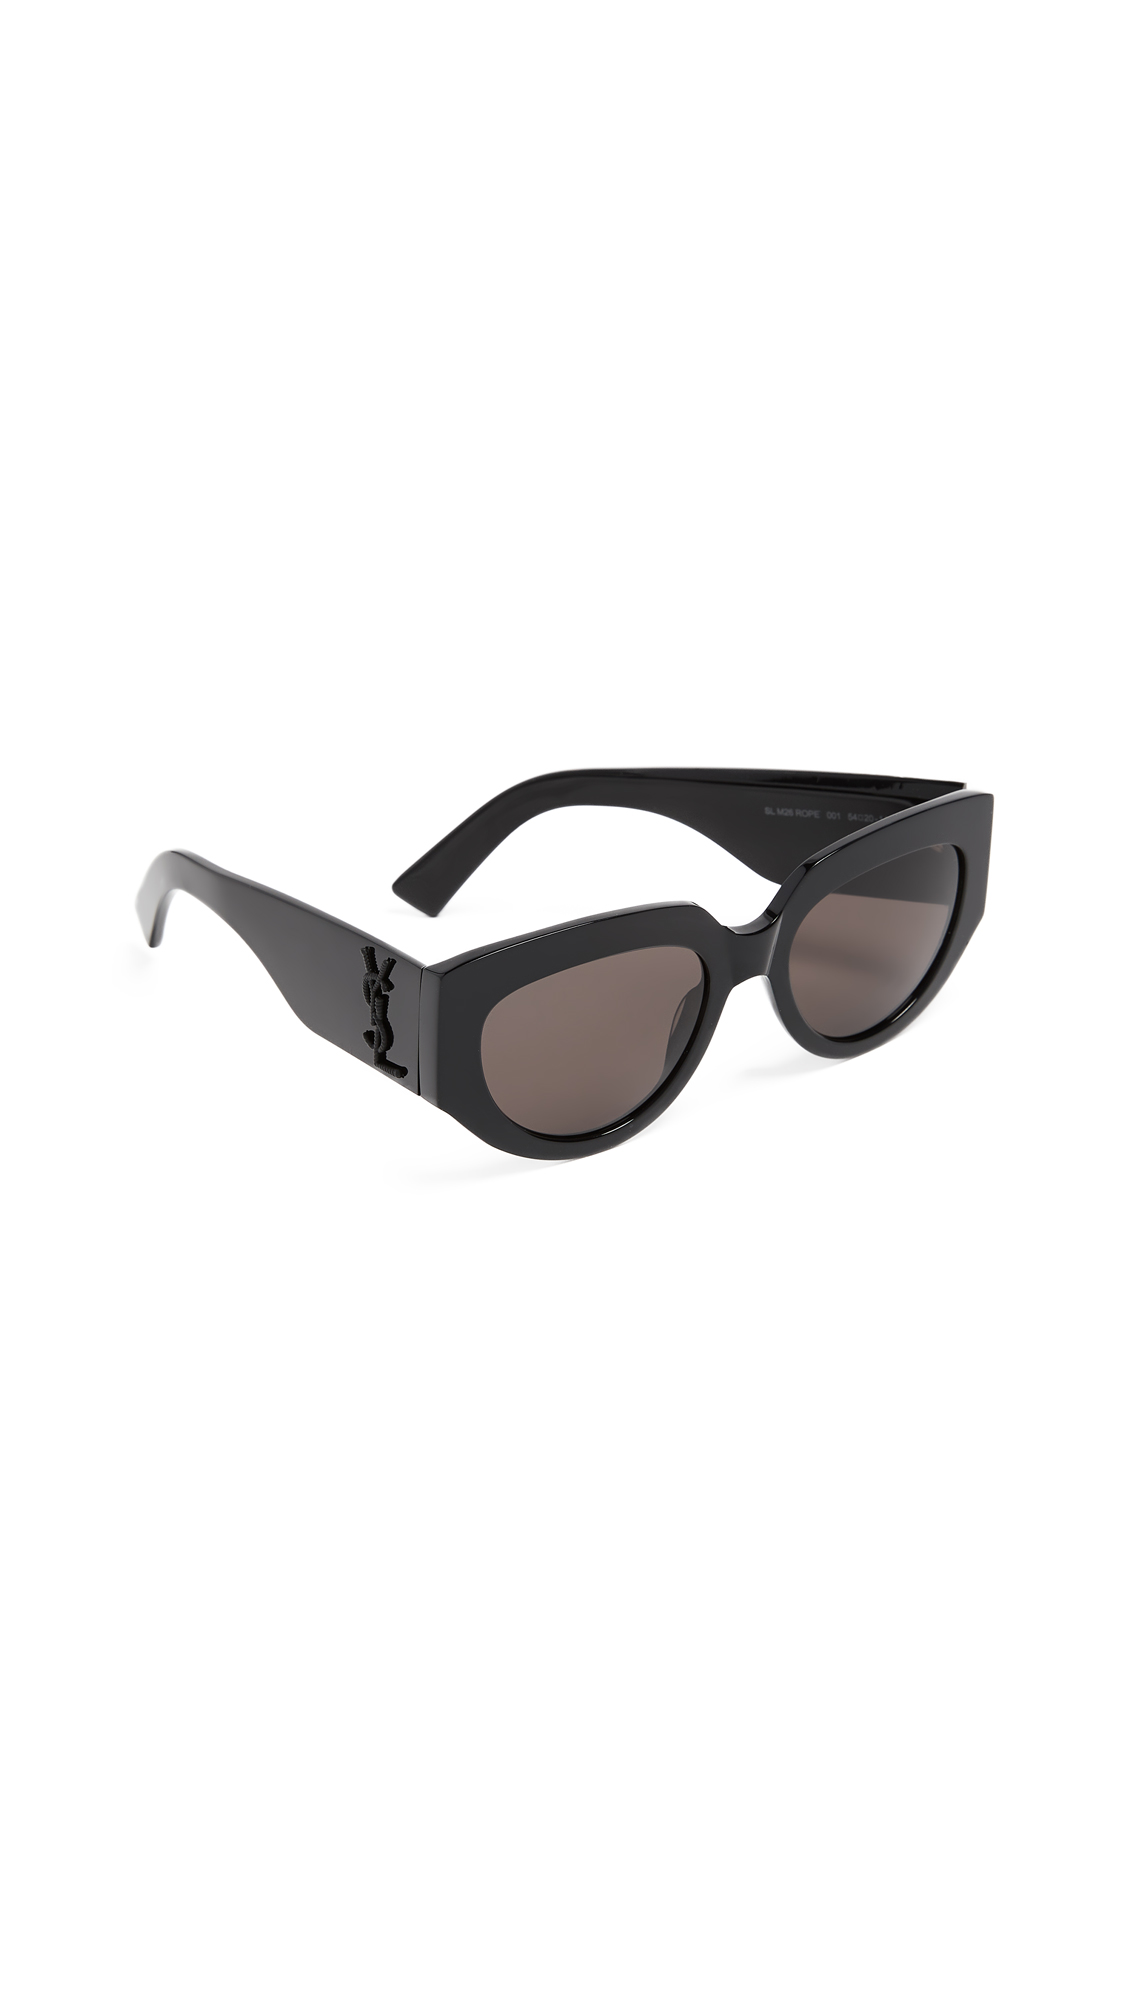 Saint Laurent SL M26 Rope Sunglasses In Black/Solid Grey